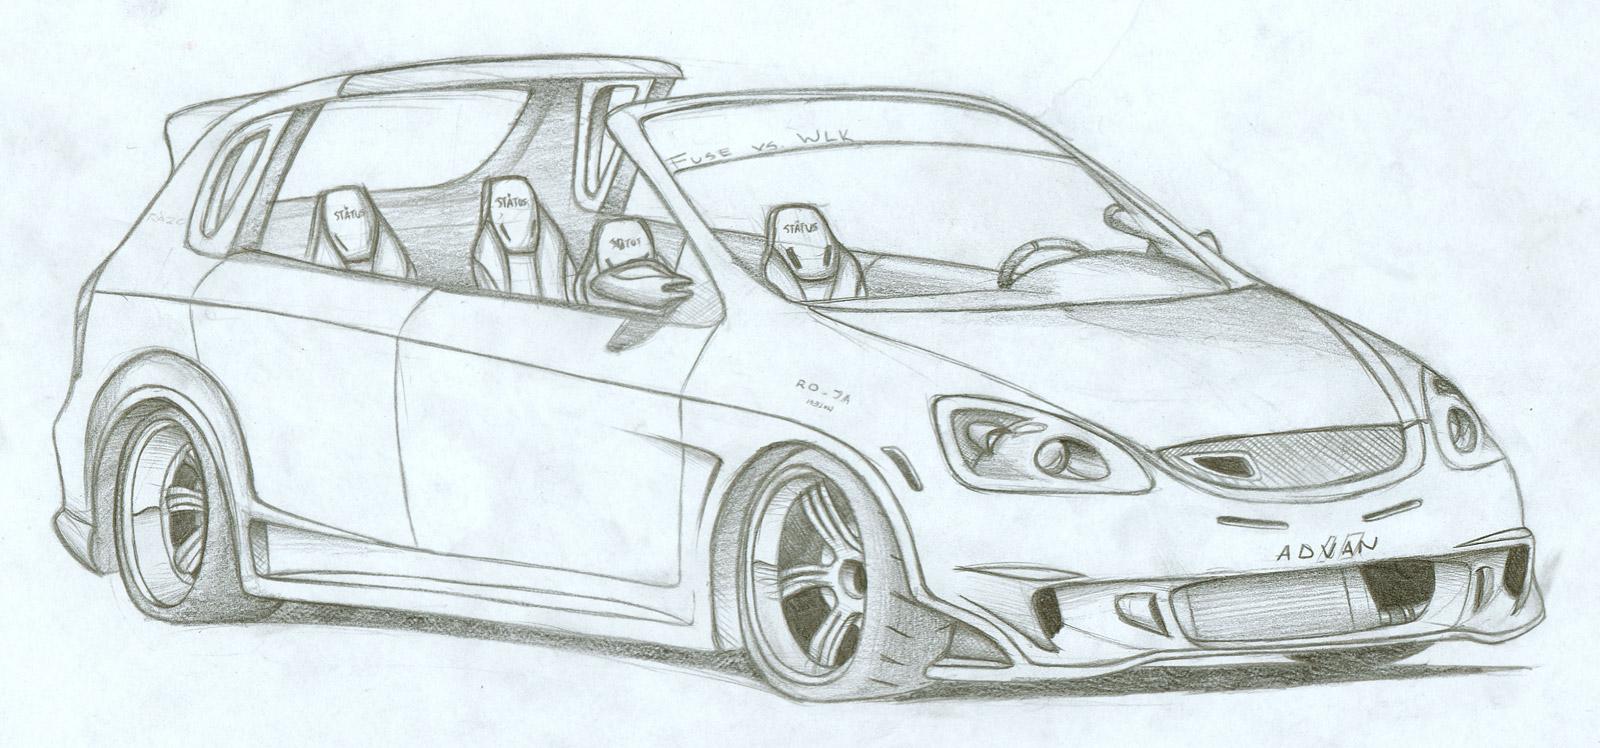 hatchback drawing at getdrawings com